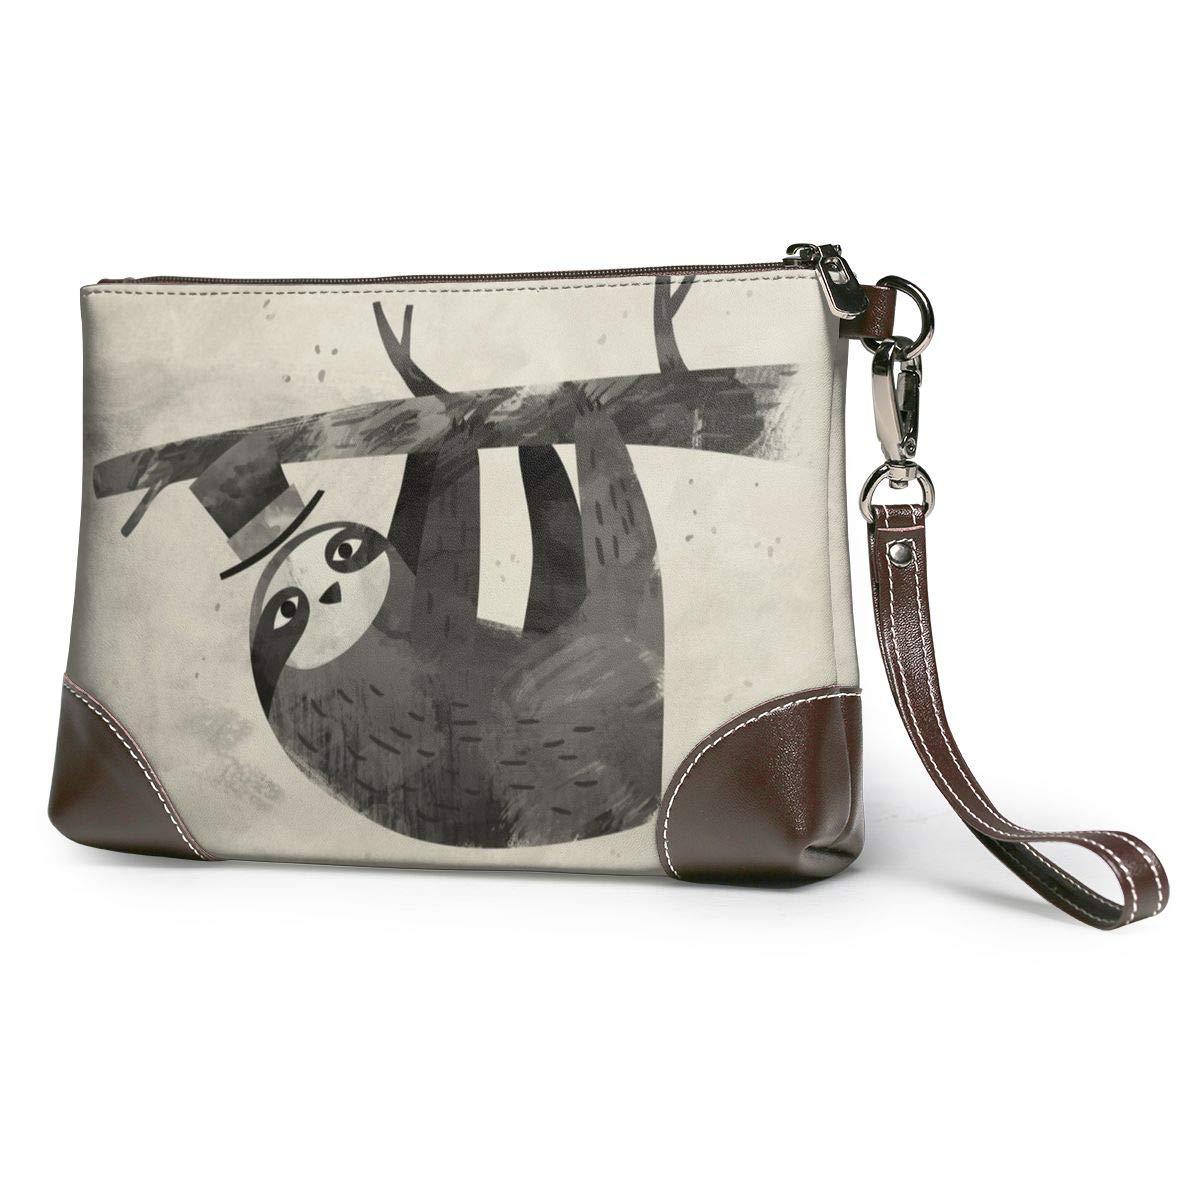 Mr Sloth Canvas Makeup Bag Pouch Purse Handbag Organizer with Zipper